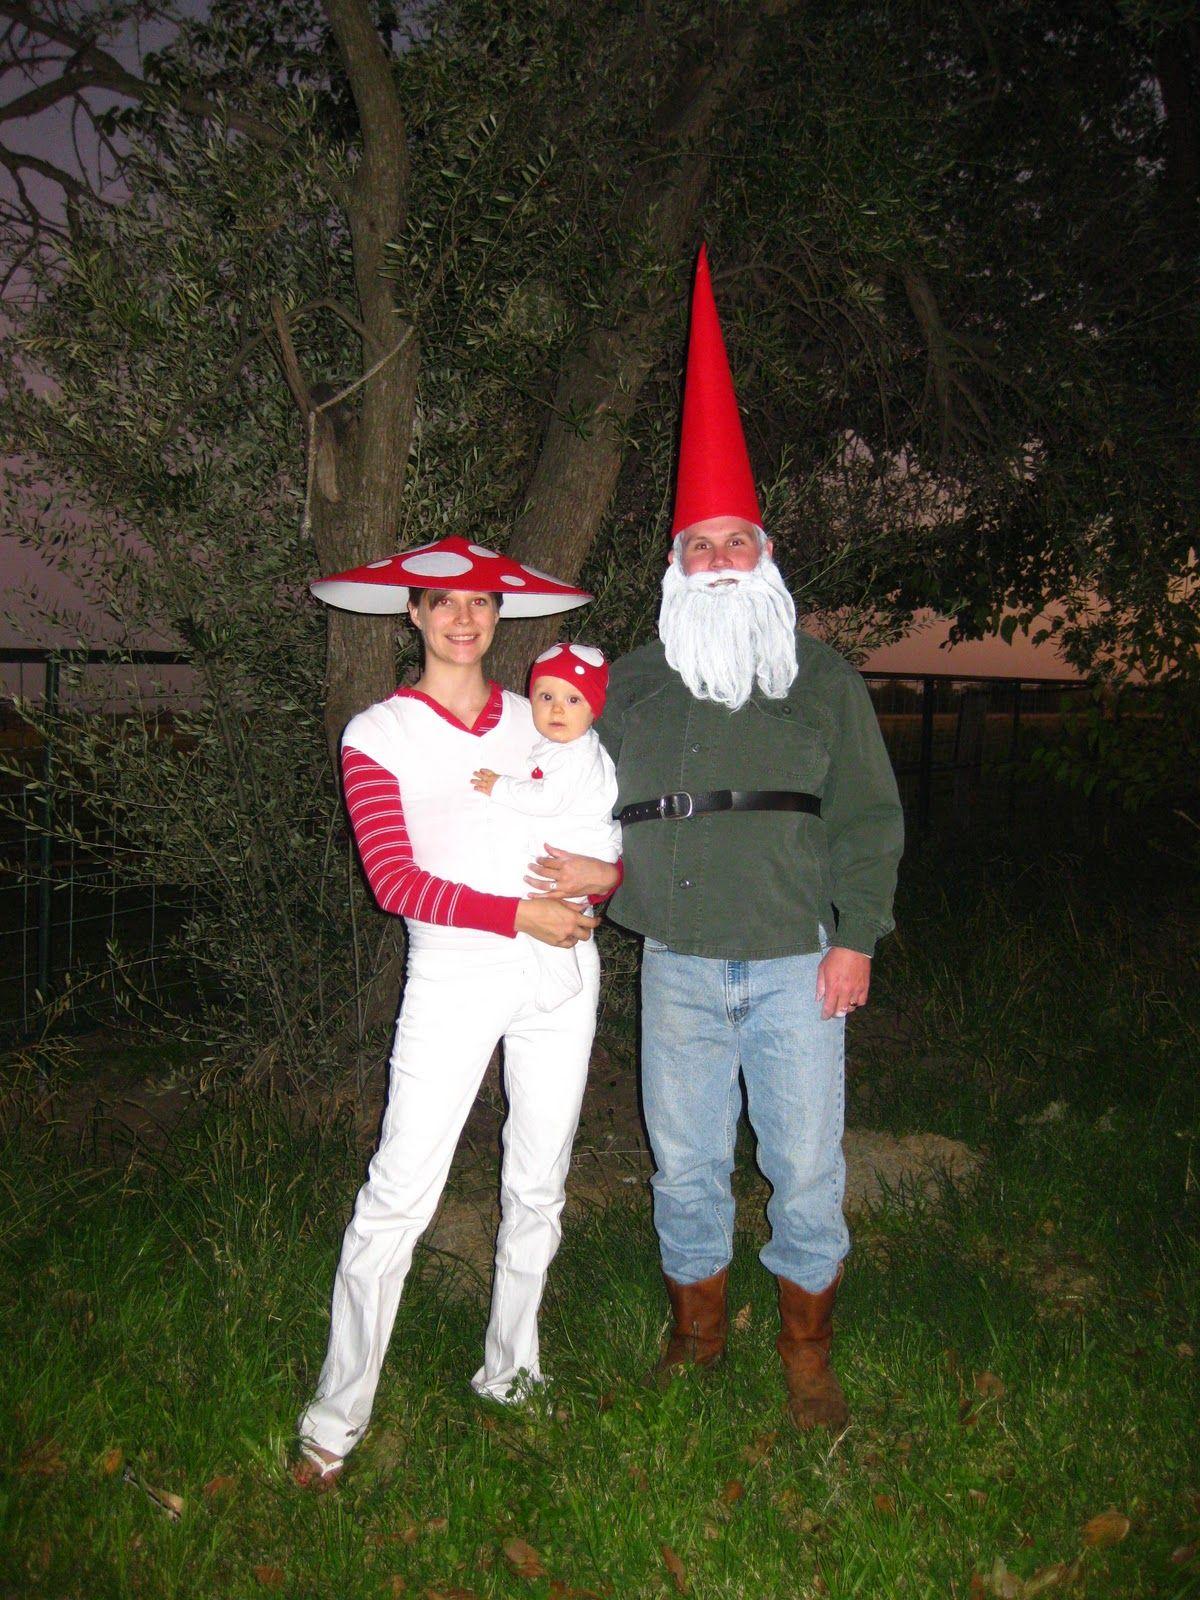 DIY Tree Costume | Tree costume, Halloween costume contest and ...